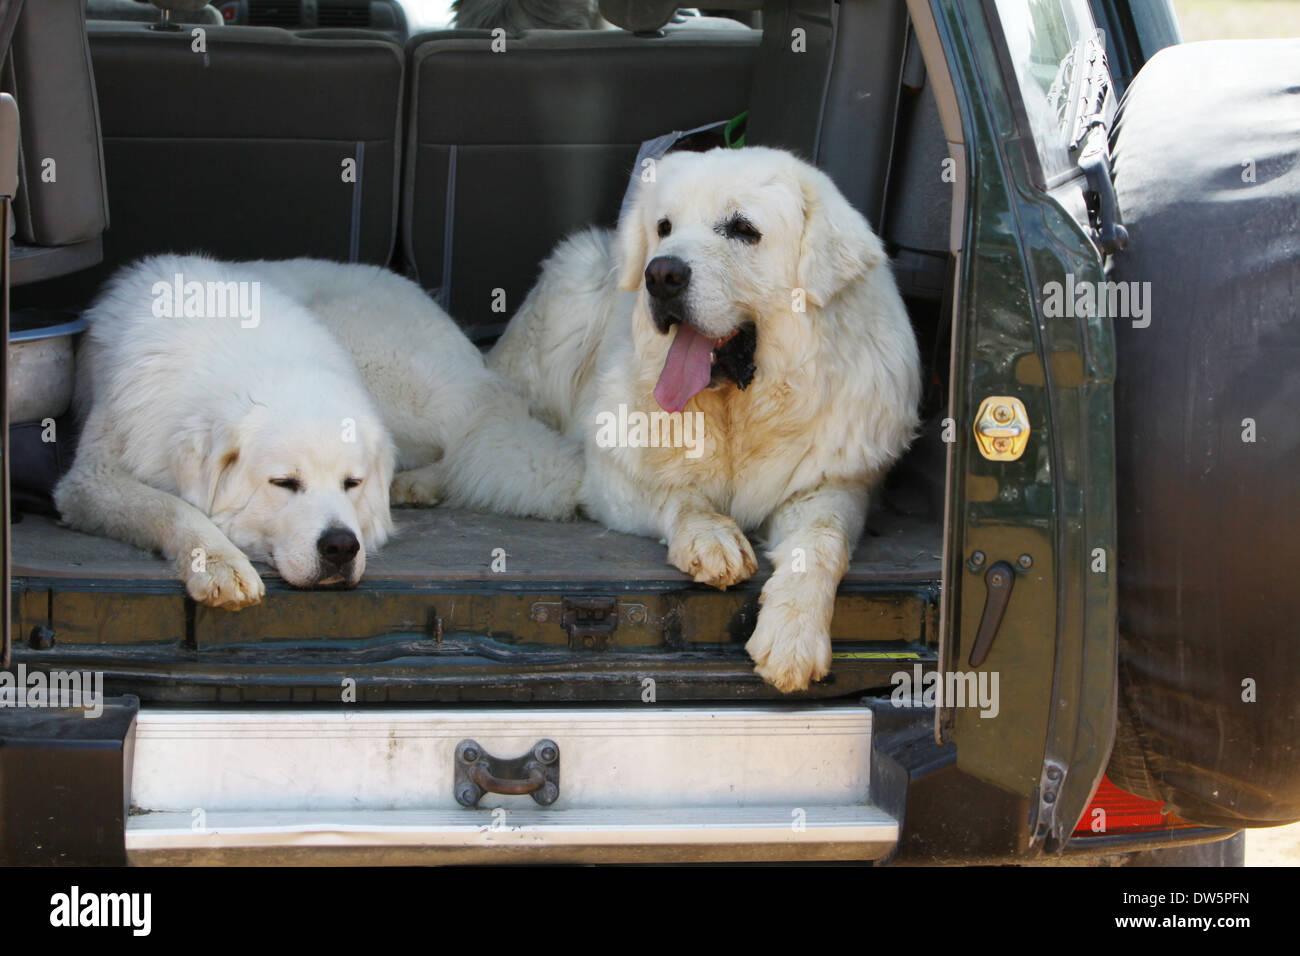 Dog Polish Tatra Sheepdog / Tatra Mountain Sheepdog / Podhale / adult and young lying in the trunk of the car Stock Photo